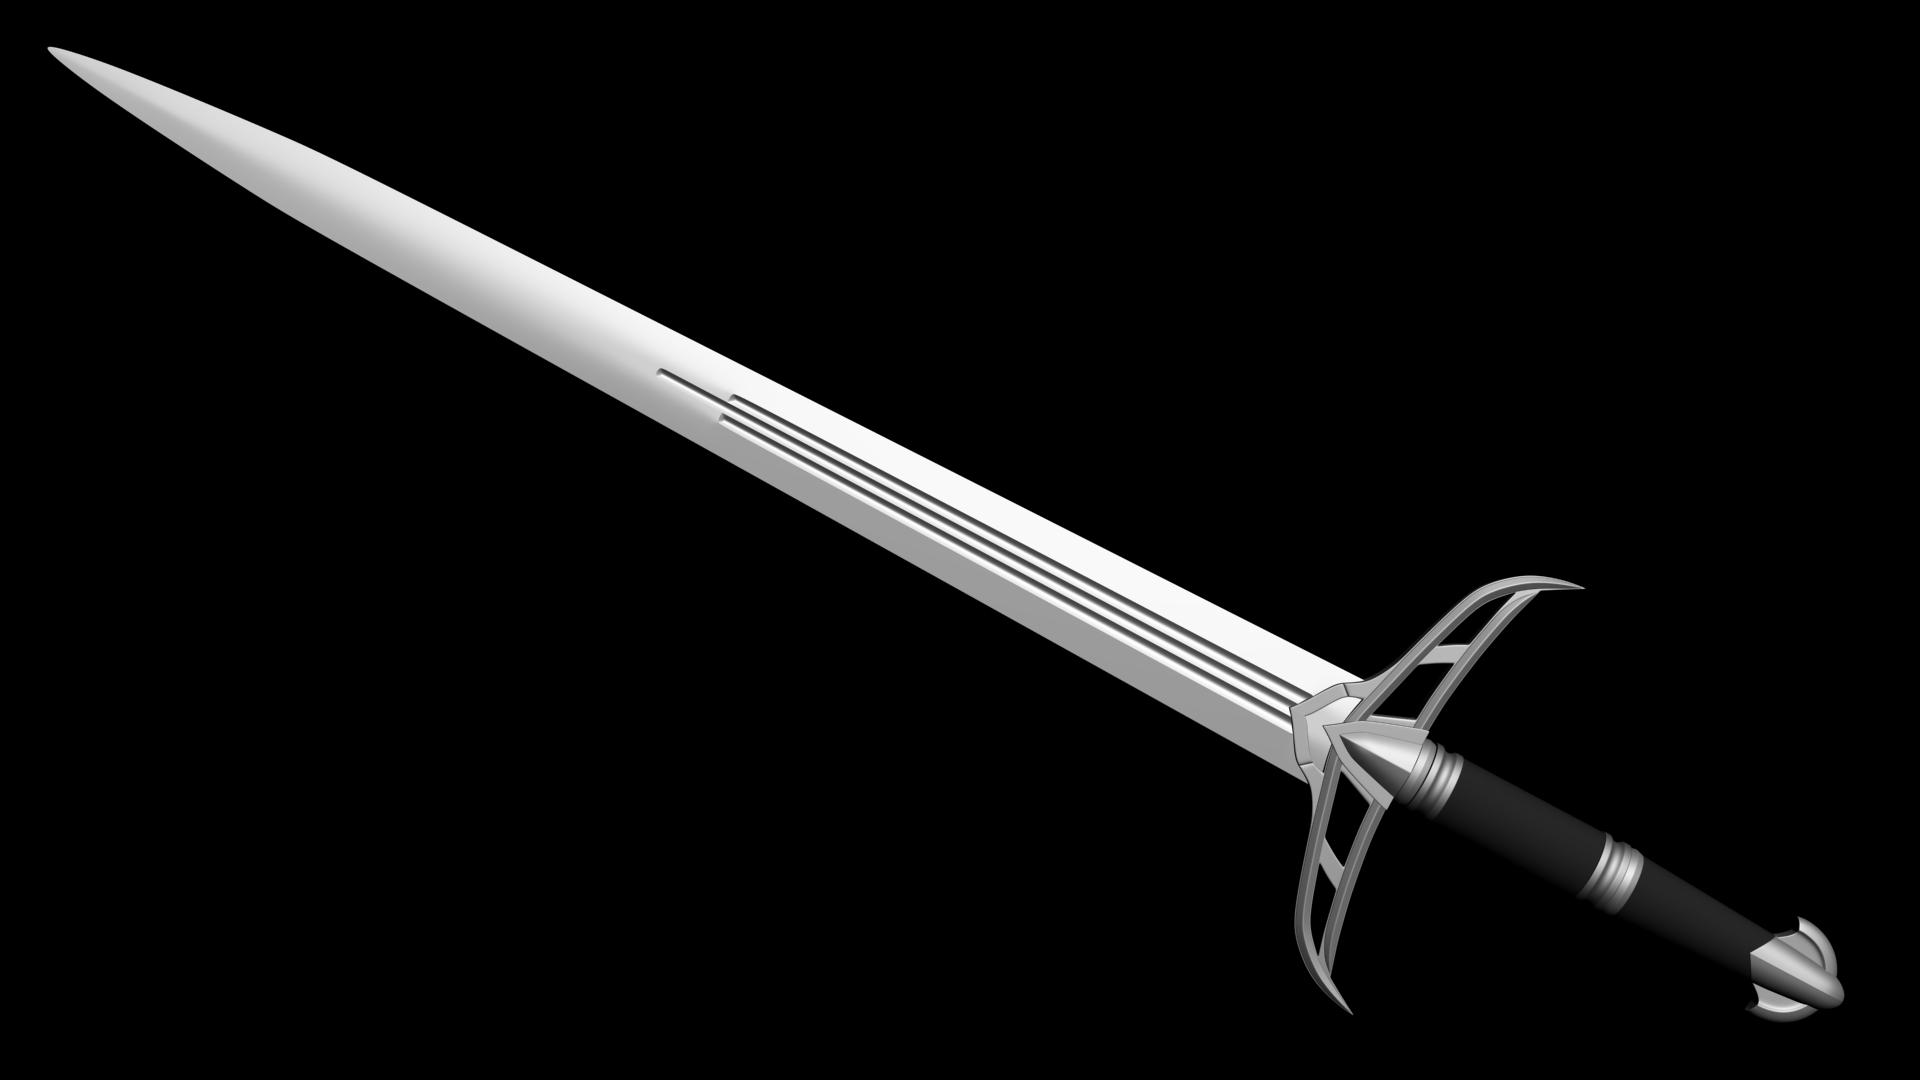 Knife clipart picsart. Sword twenty six isolated